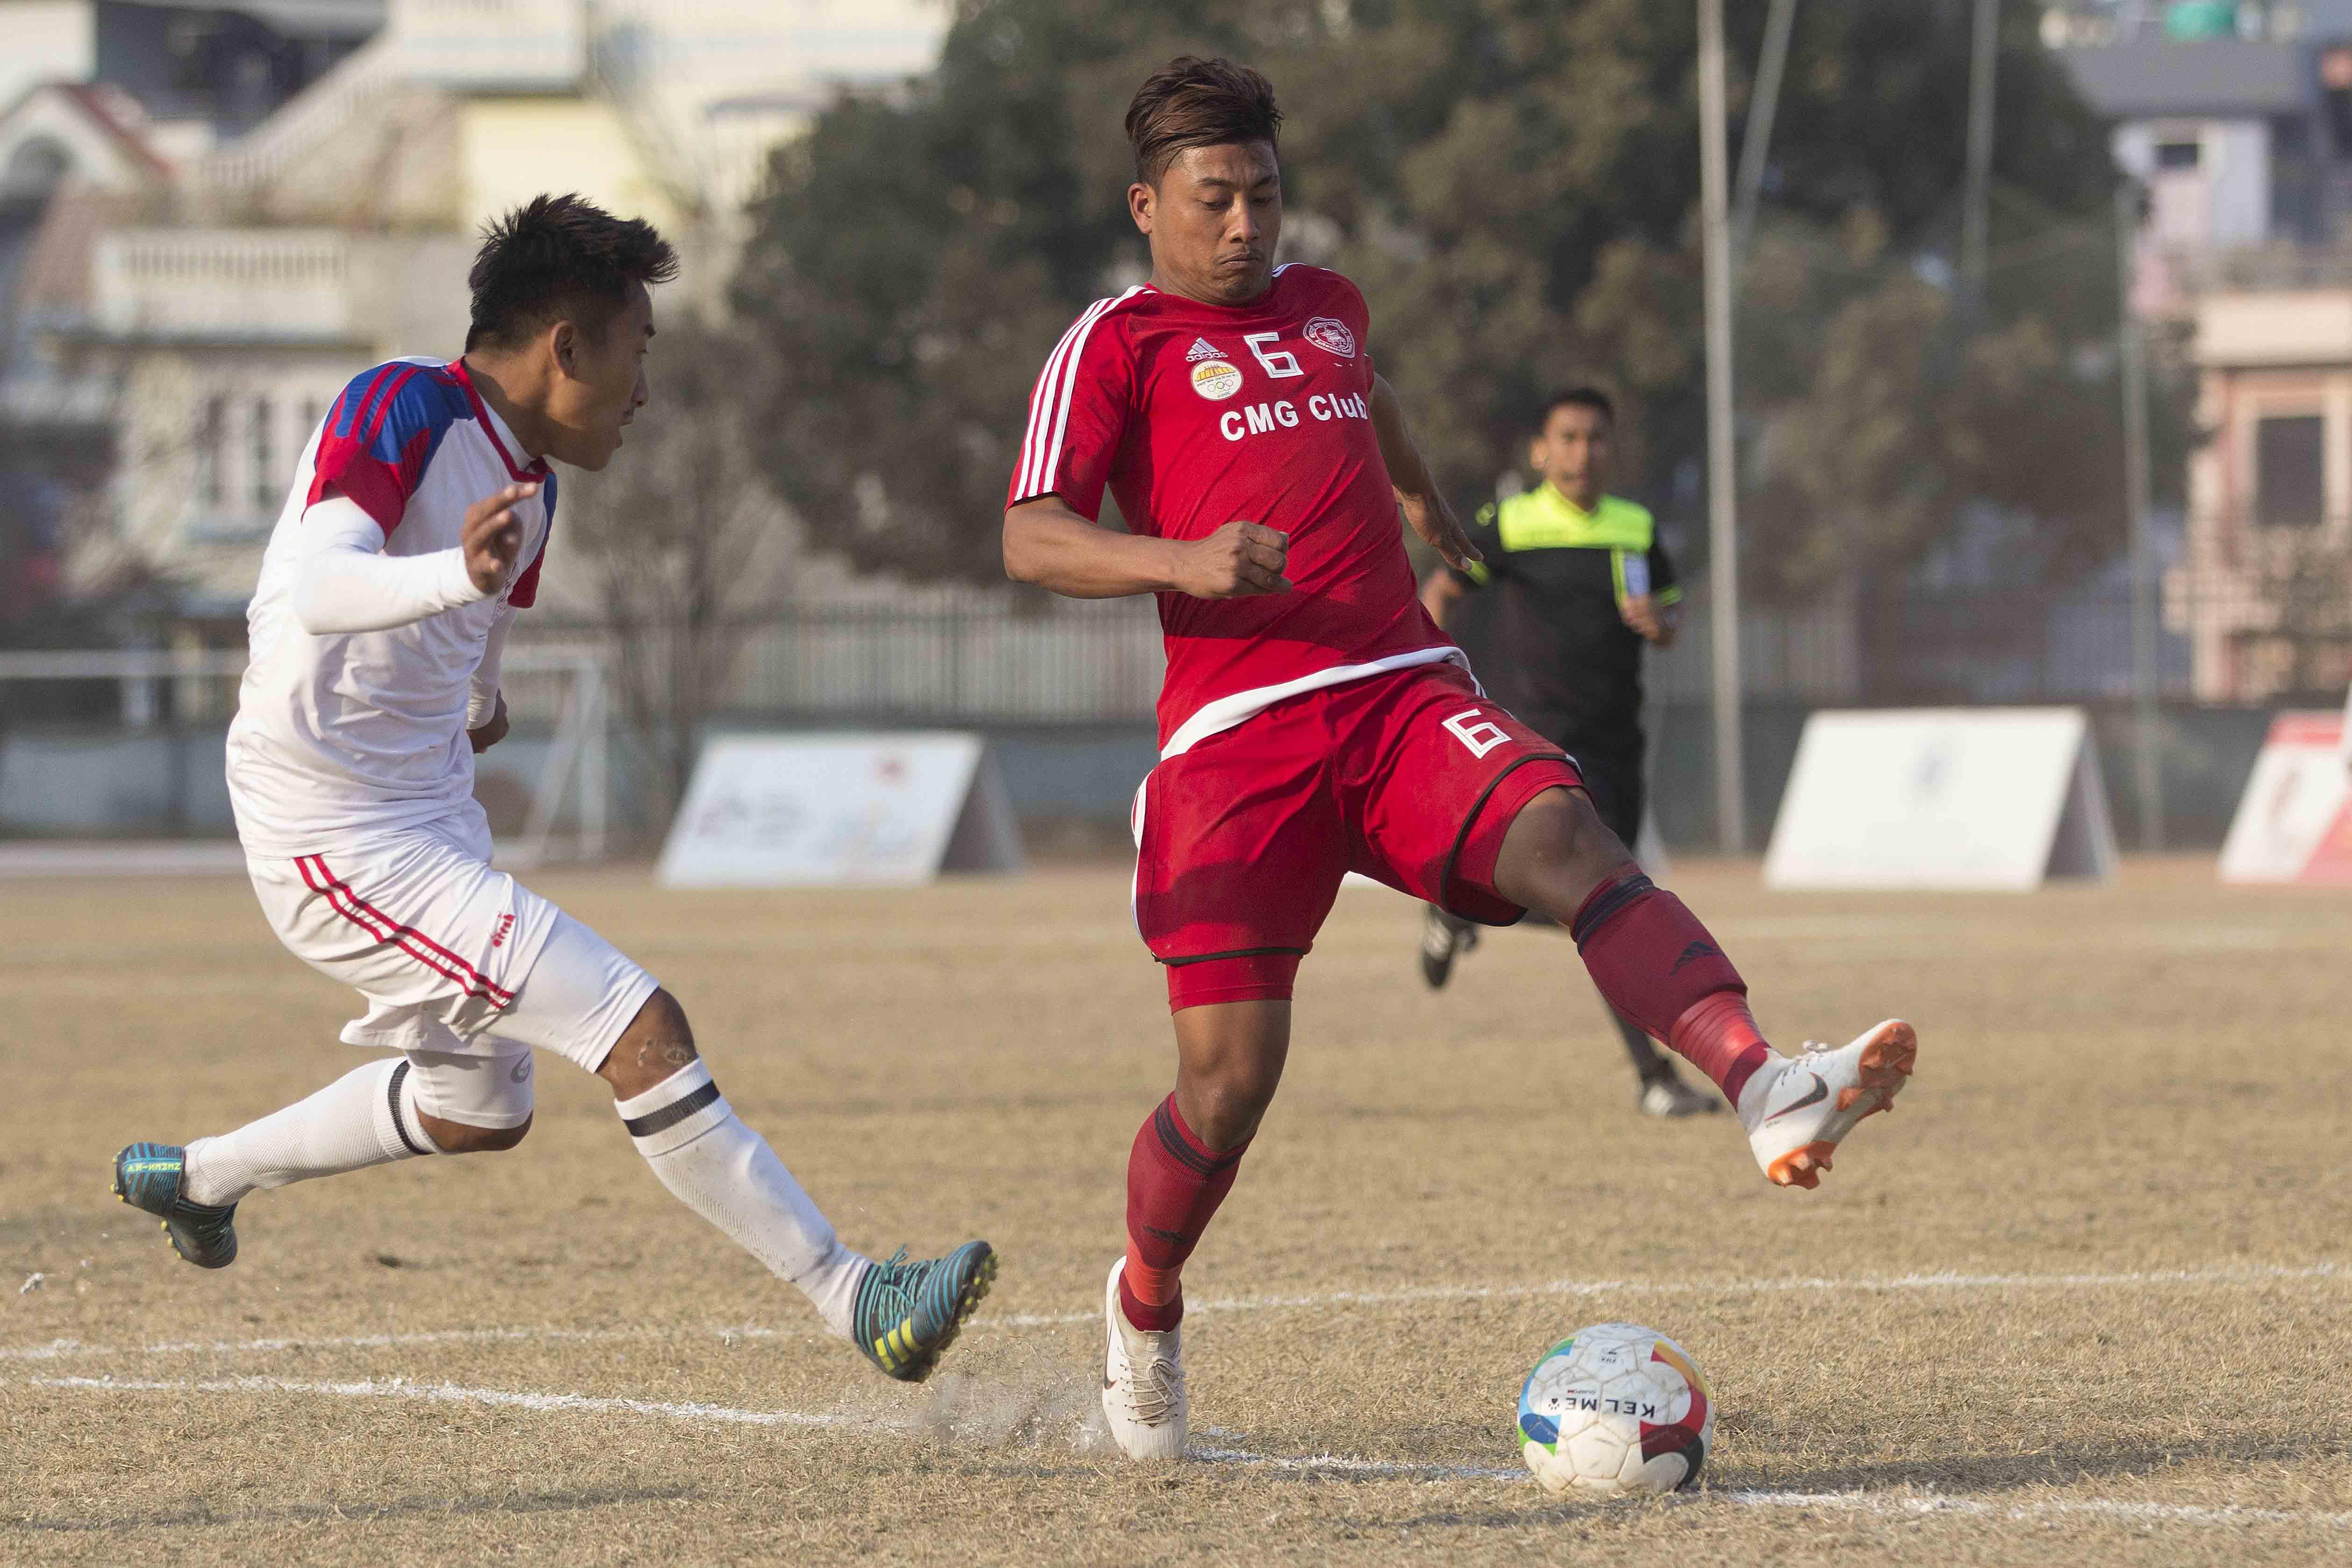 Players of Brigade Boys Club (left) and Sankata Club vie for the ball during their Pulsar Martyru2019s Memorial u2018Au2019 Division League match at APF Stadium in Kathmandu on Saturday, December 22, 2018. Photo: THT